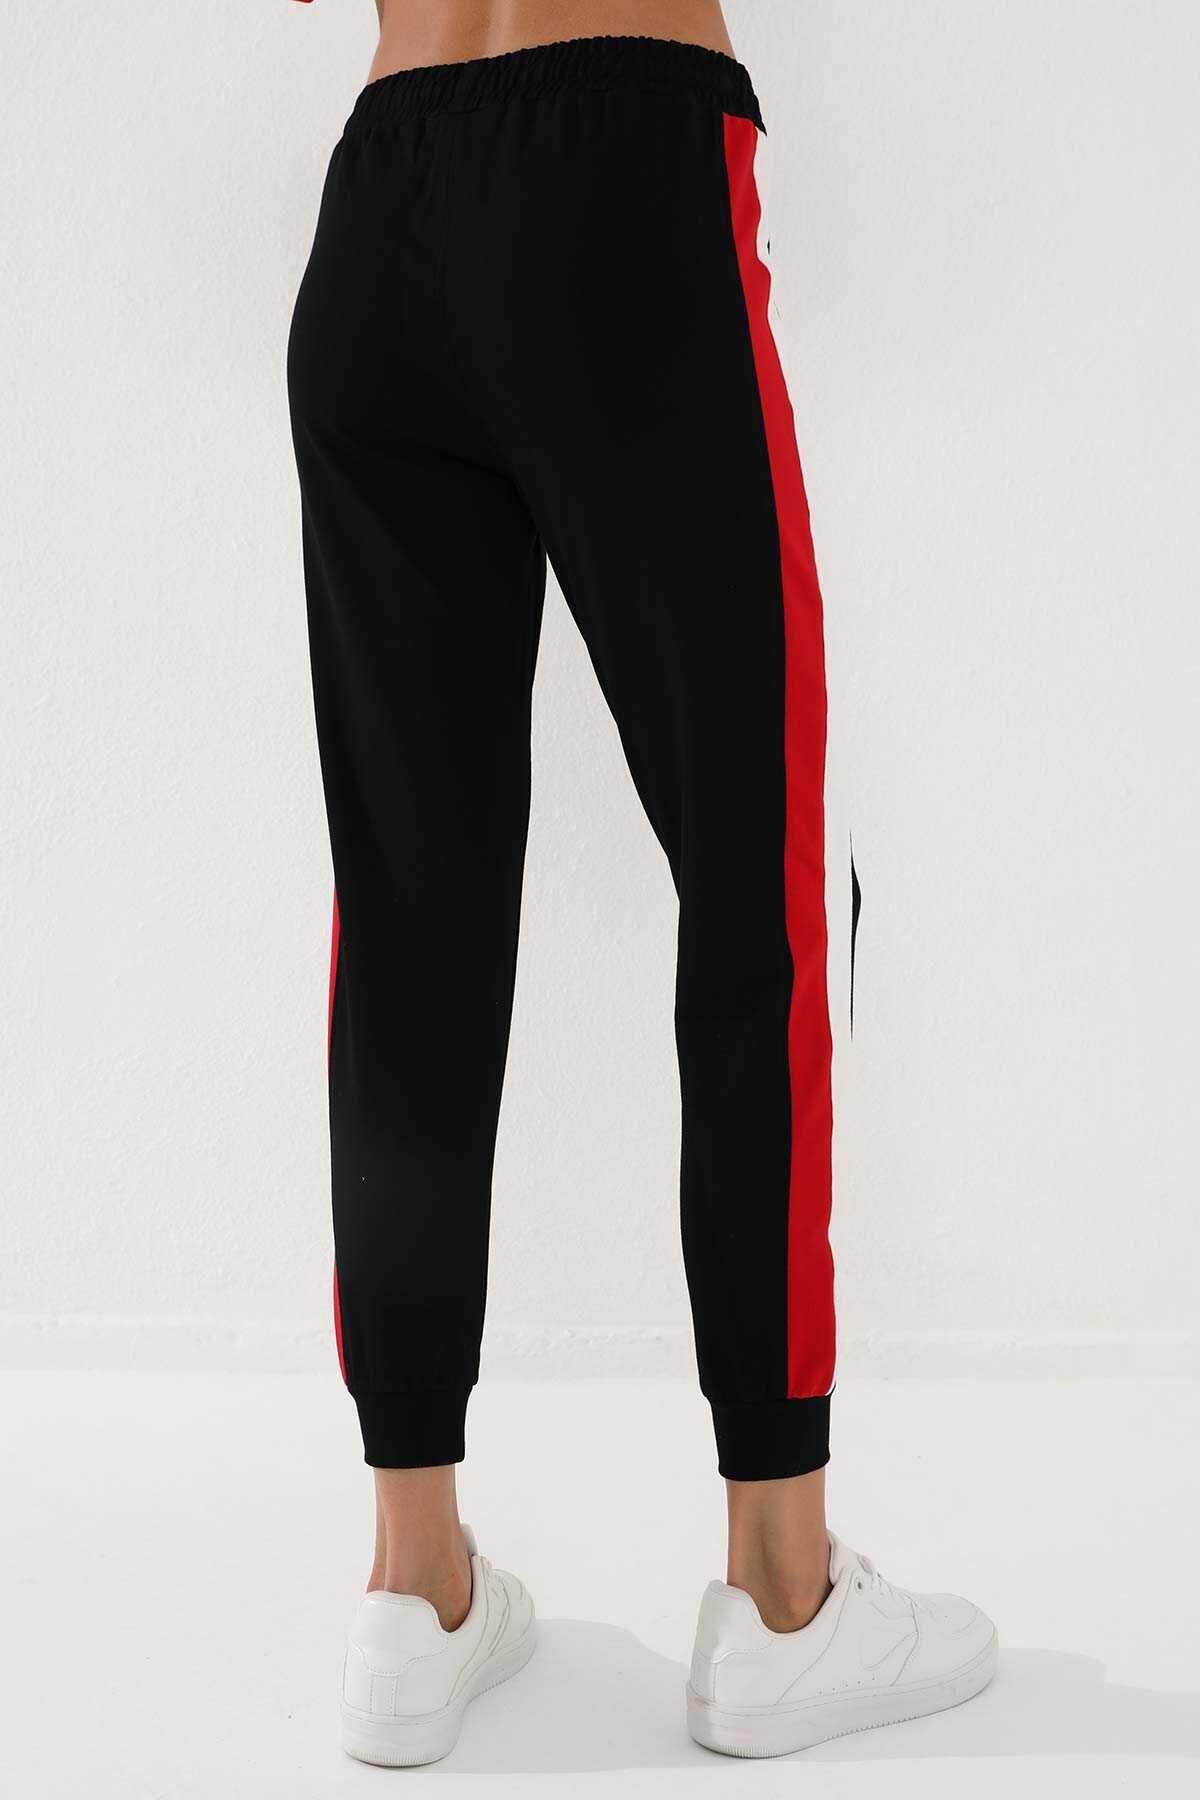 Tommy Life Toptan Siyah-Siyah Kadın Yarım Fermuar Cepli Rahat Form Jogger Eşofman Tunik Takım-95249